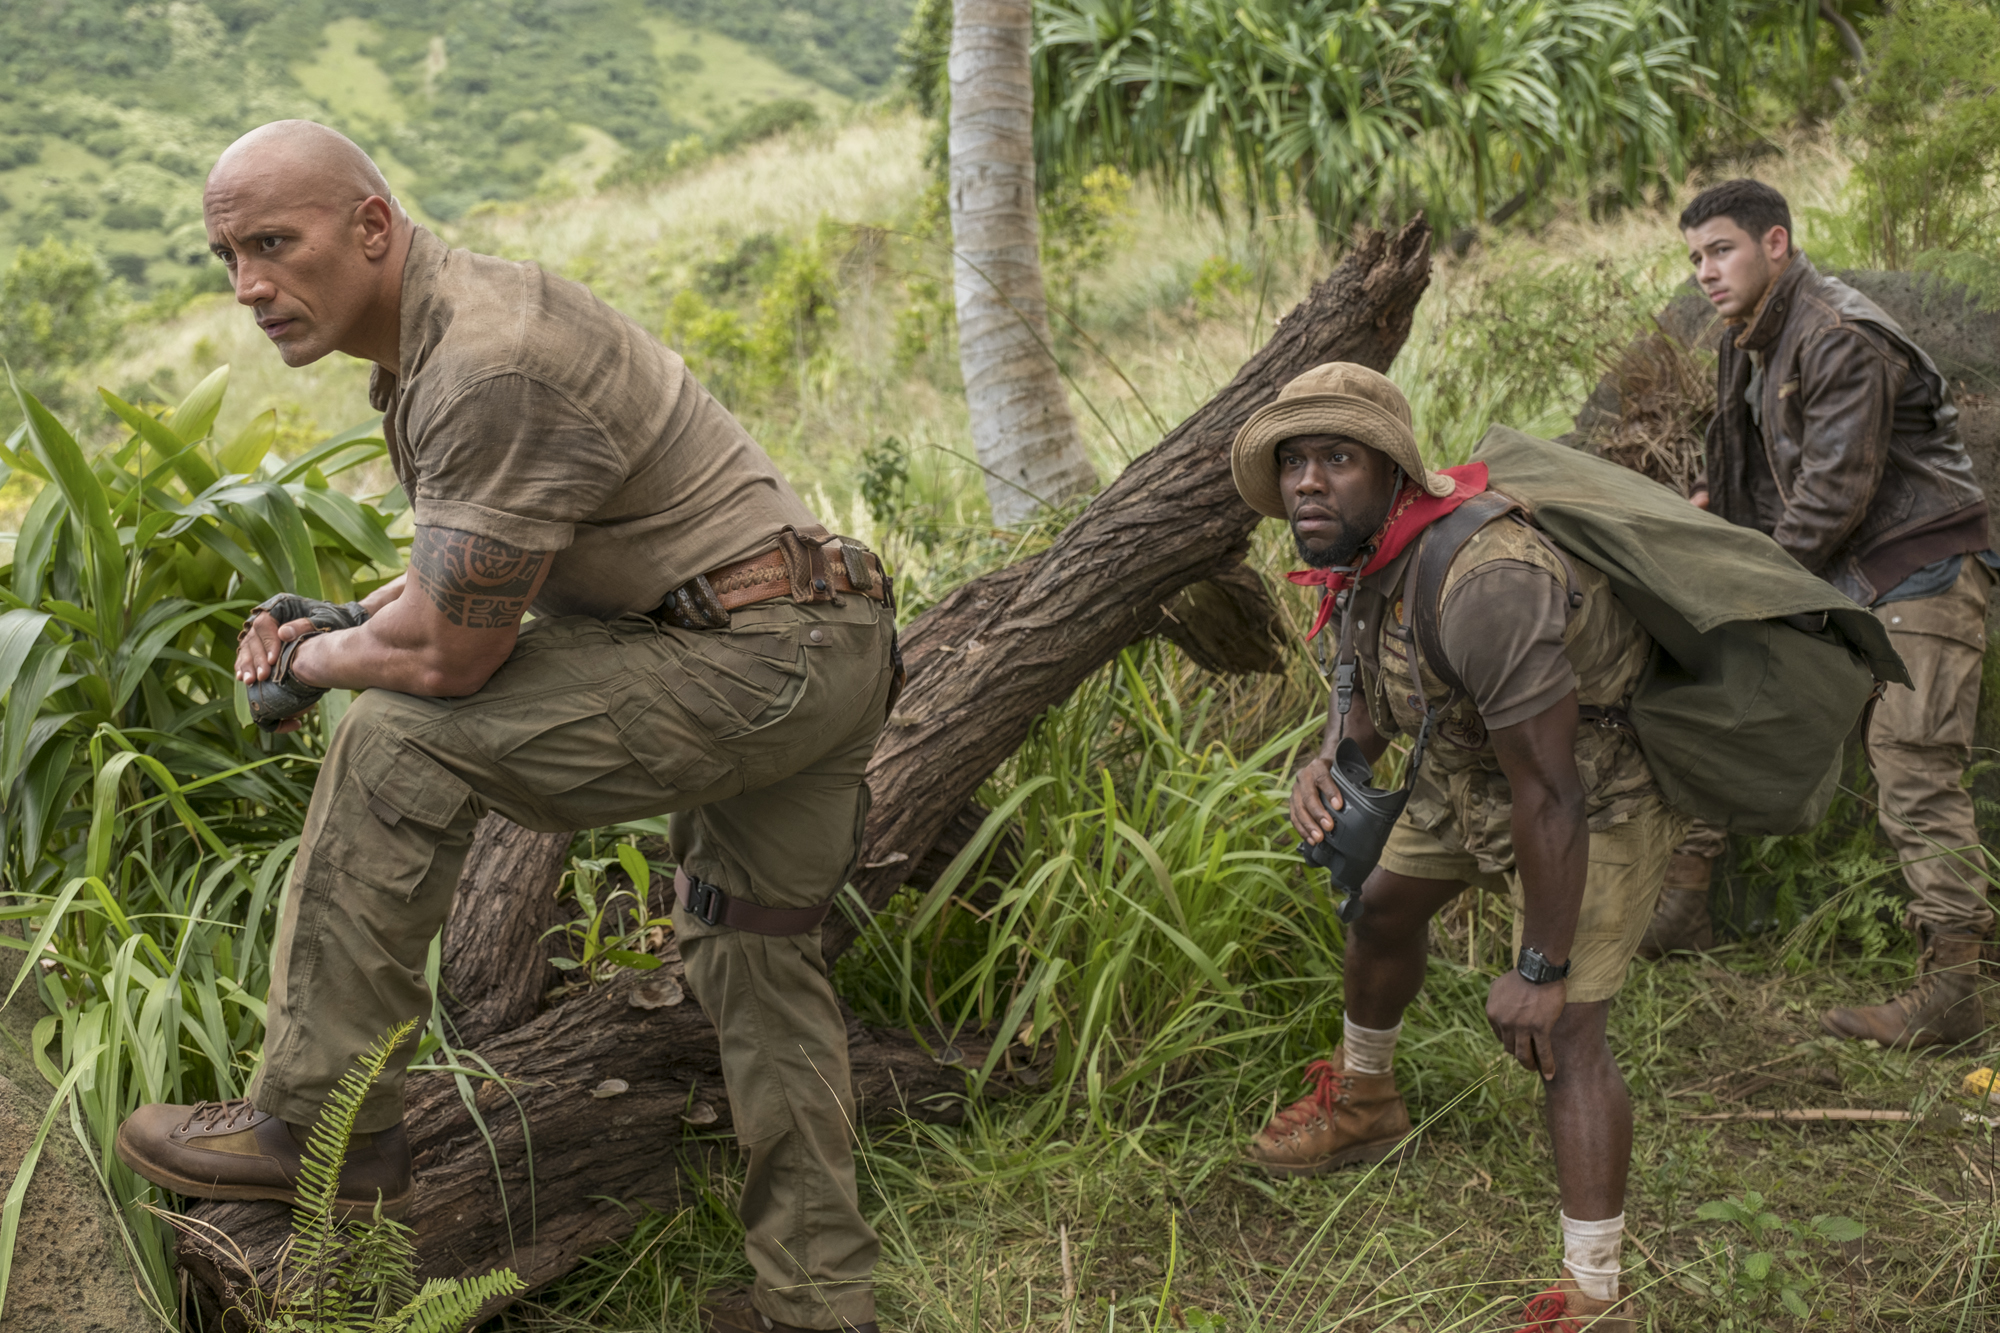 Jumanji: Welcome to the Jungle، سومین فیلم پرفروش کمپانی سونی تابهامروز